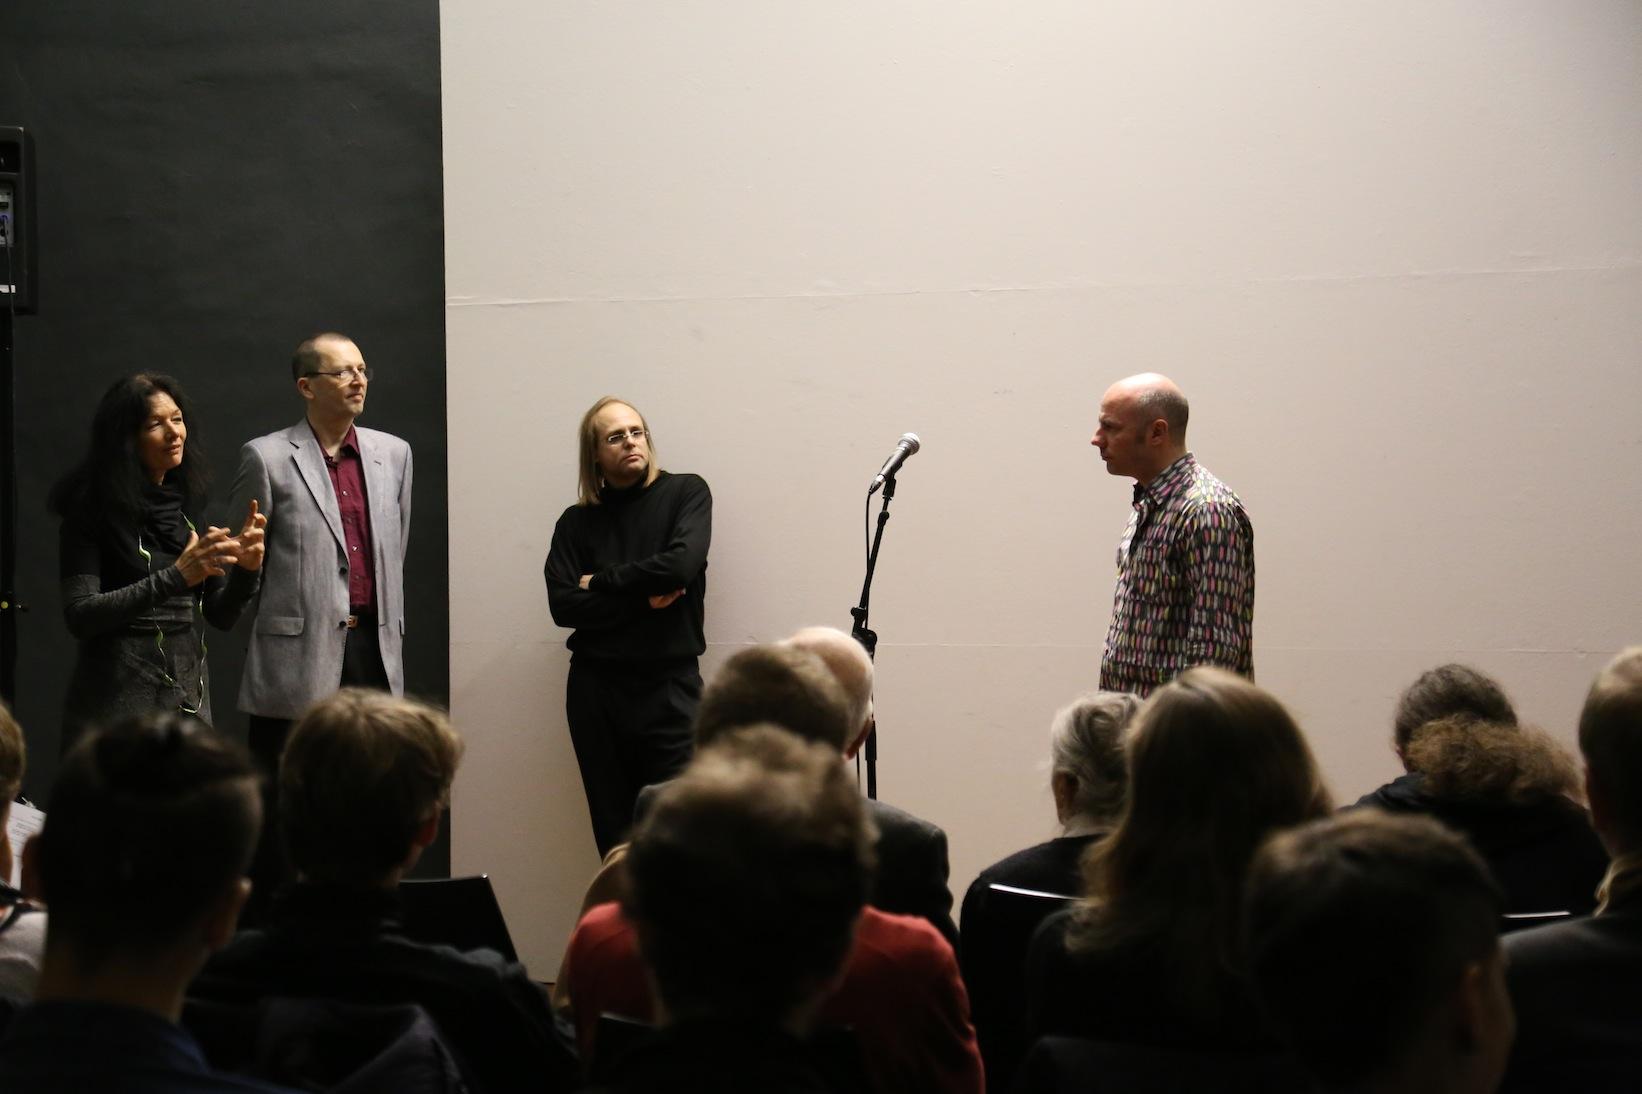 Birgit Pölzl, Daniel Mayer, Oliver Weber, Daniel Wisser